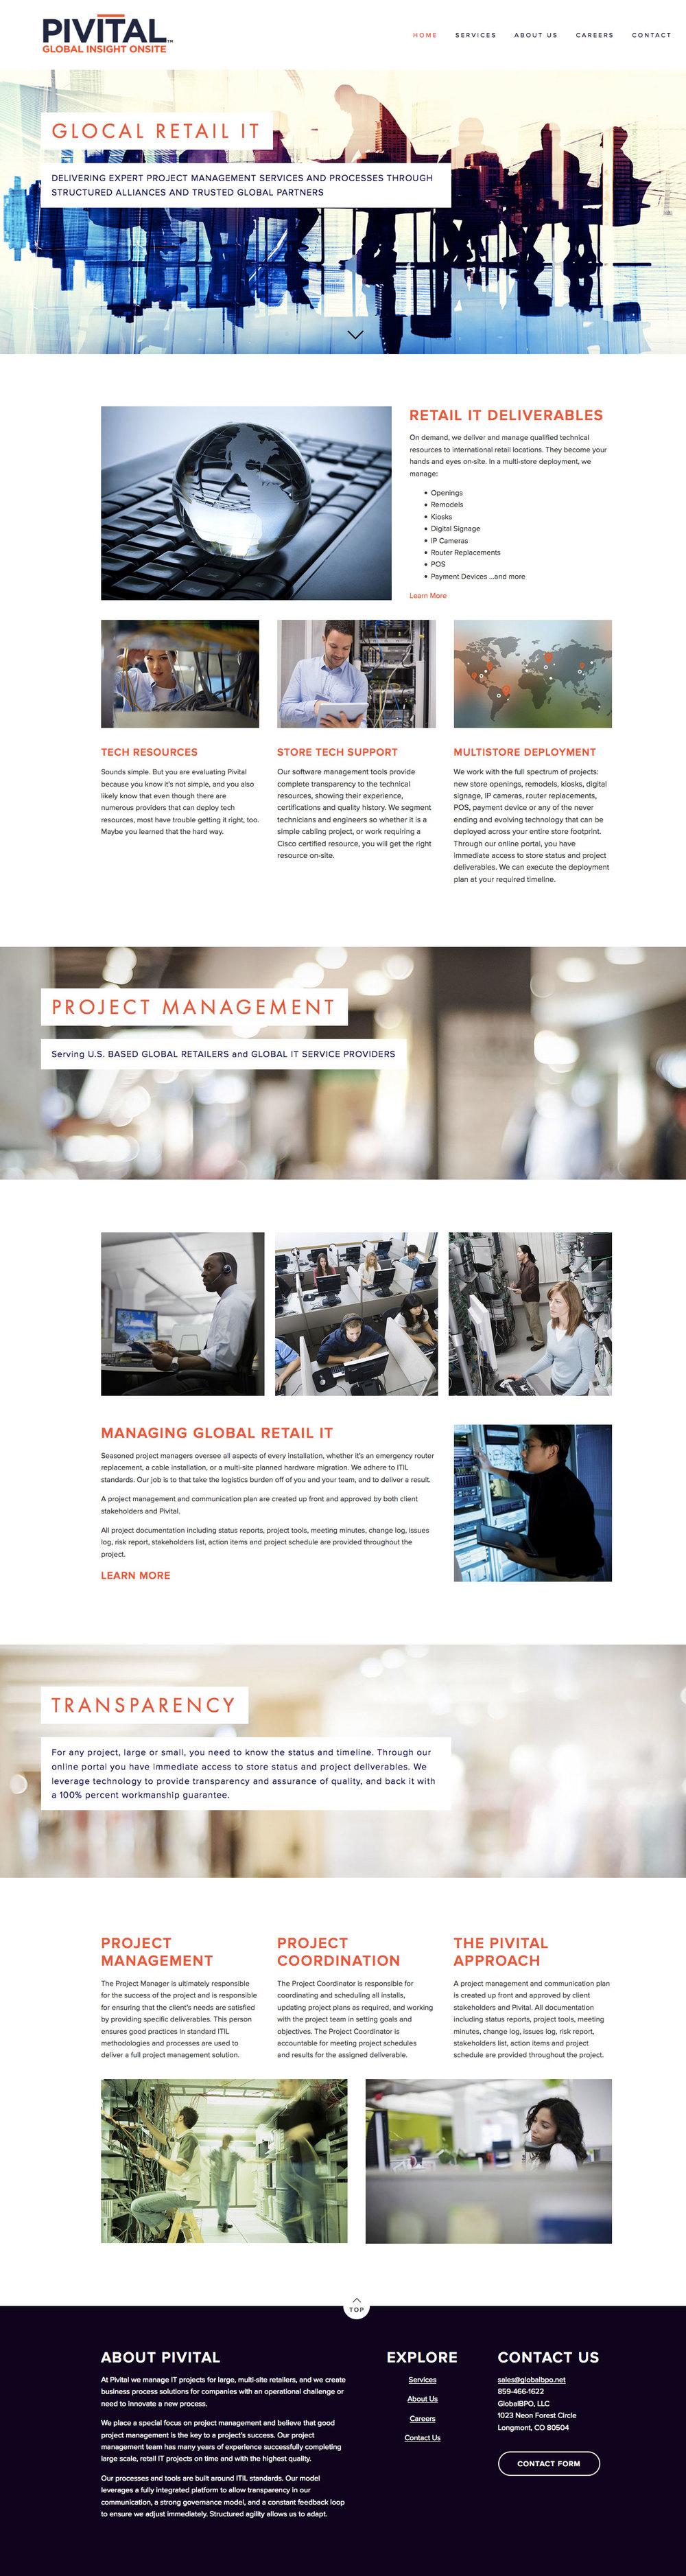 PivitalGlobal.com Website